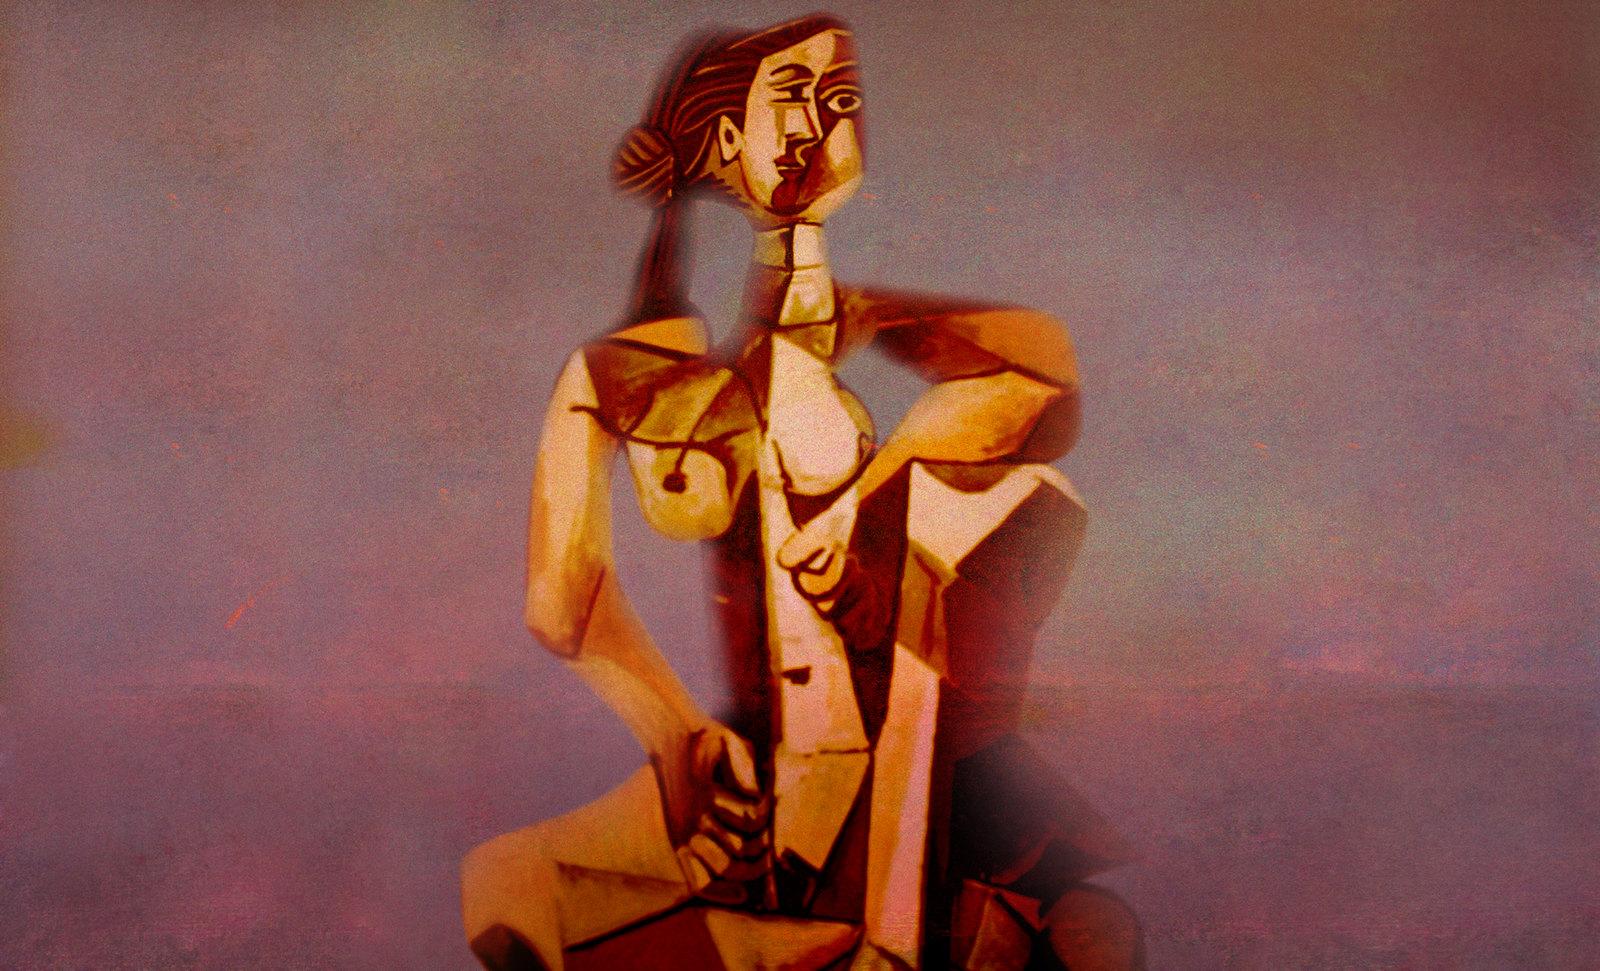 Mujer Sentada, geometrización de Pablo Picasso (1953), abstracción de Roberto Real de León (2013).